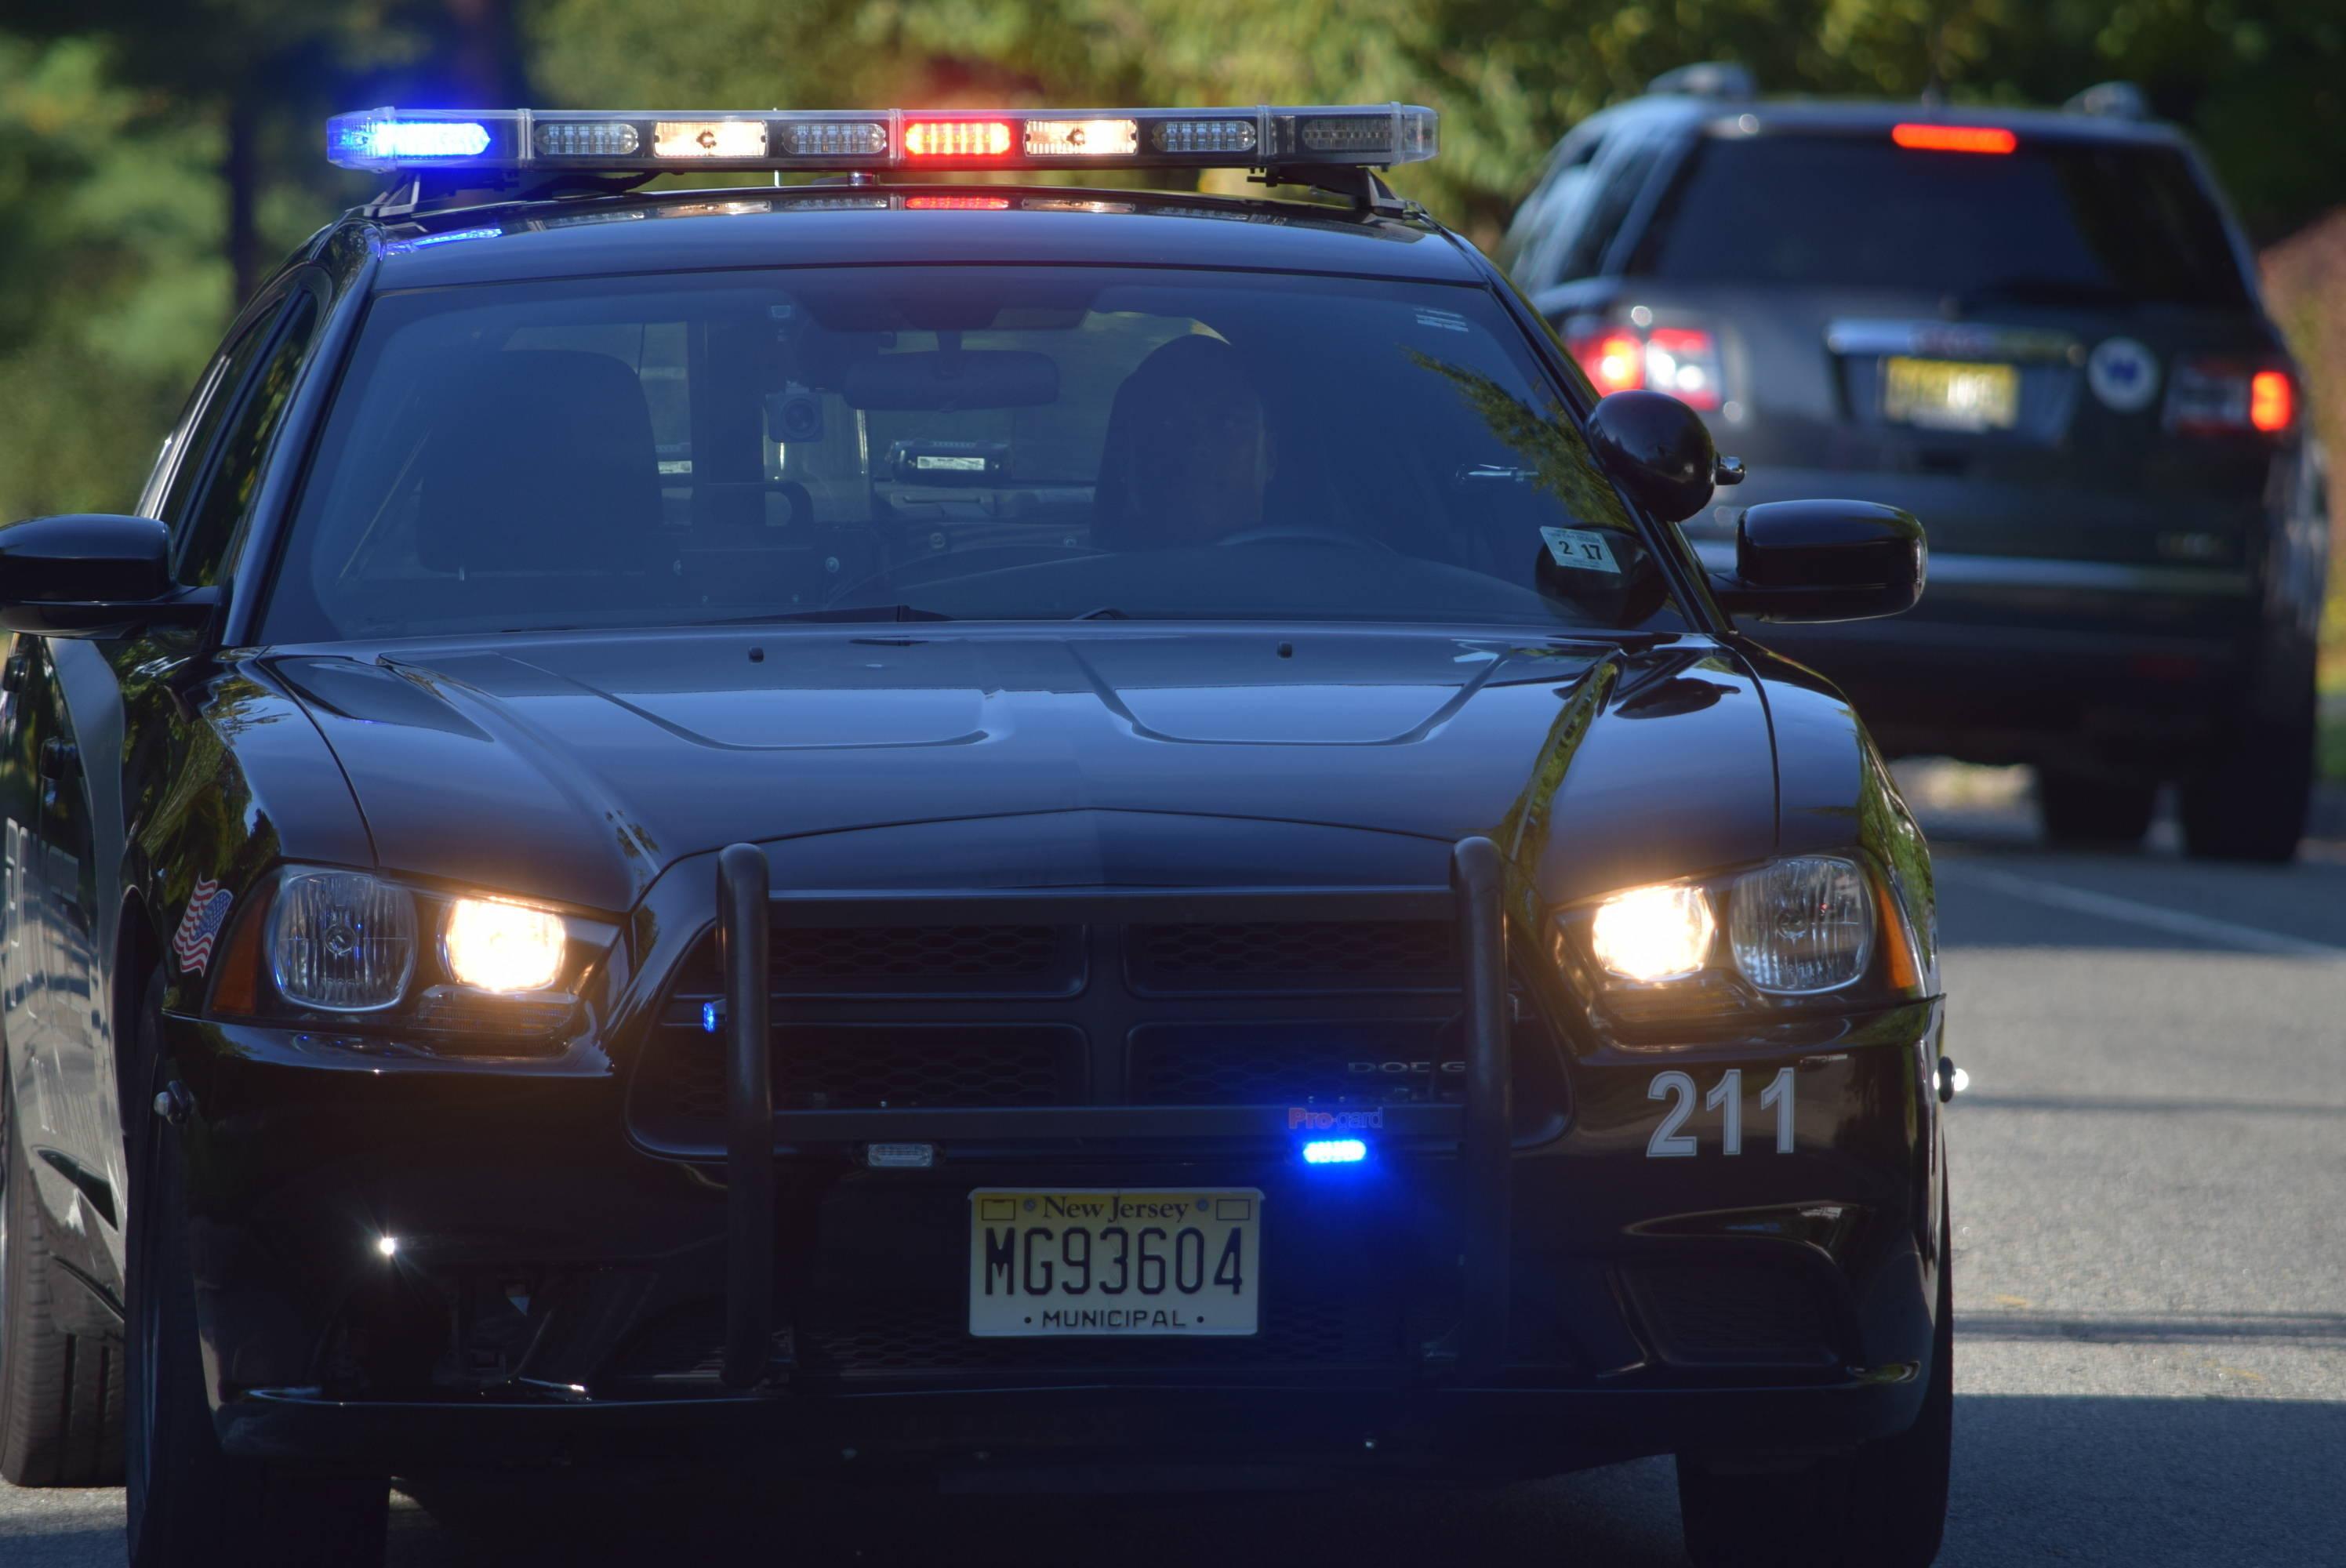 22caba4b12815903f83d_police_car.JPG